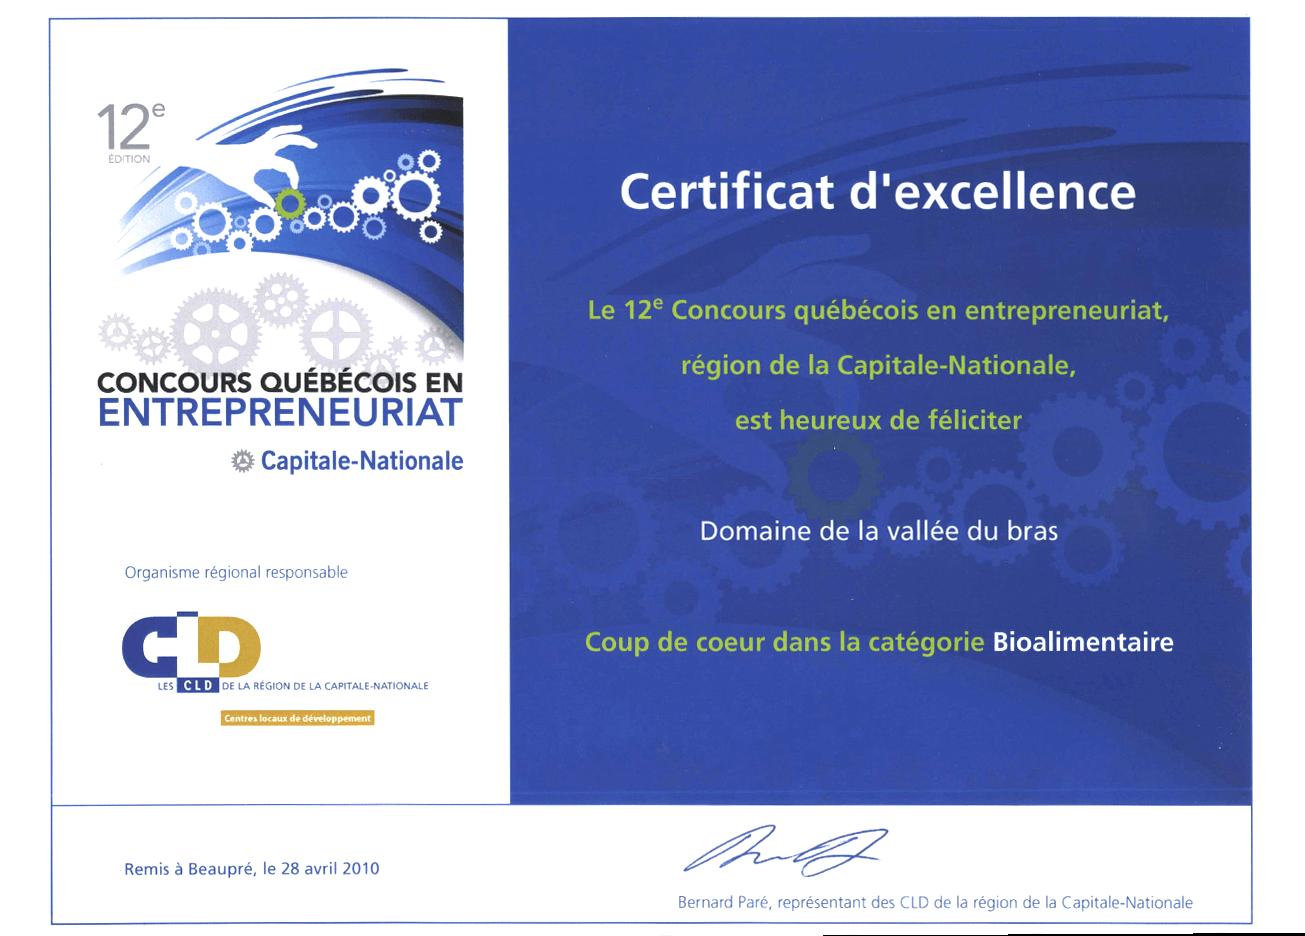 concours-entrepreneuriat2012cdb